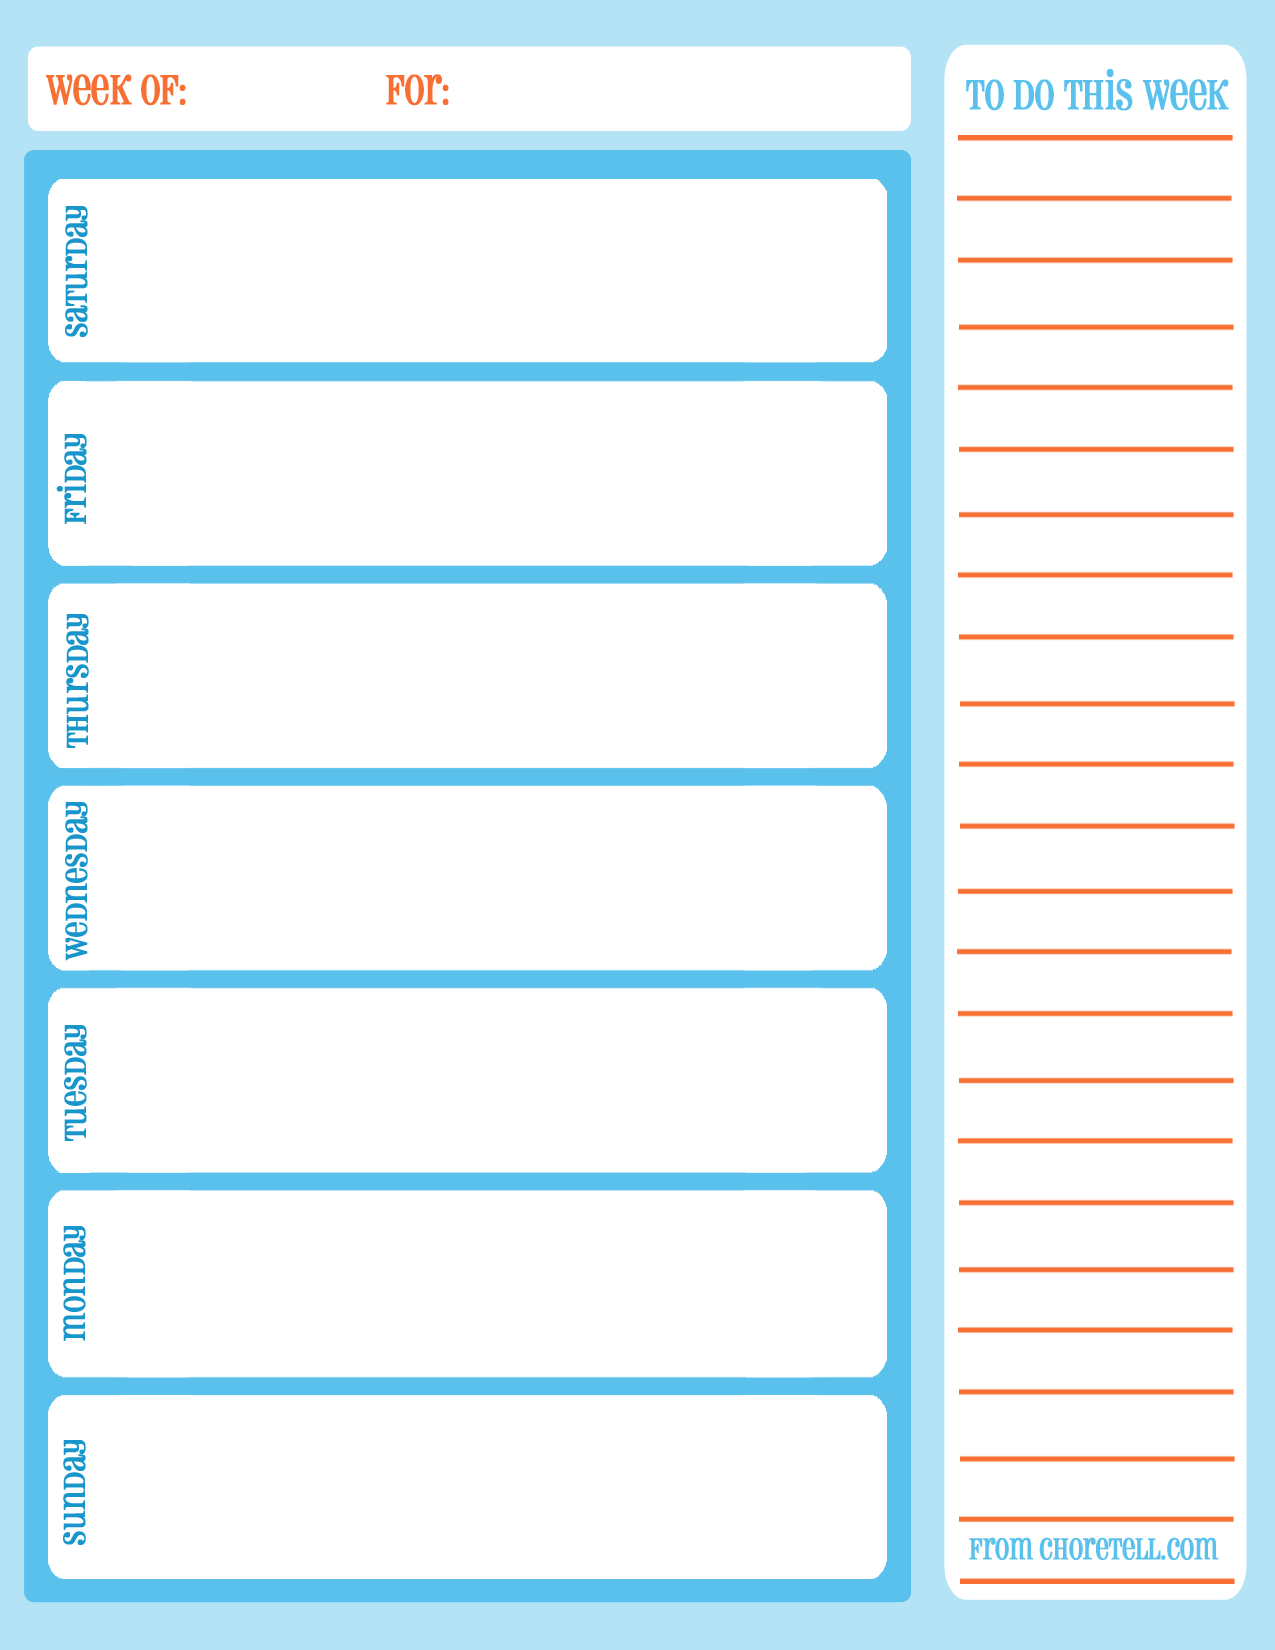 Free printable weekly chore calendar | Free printable downloads